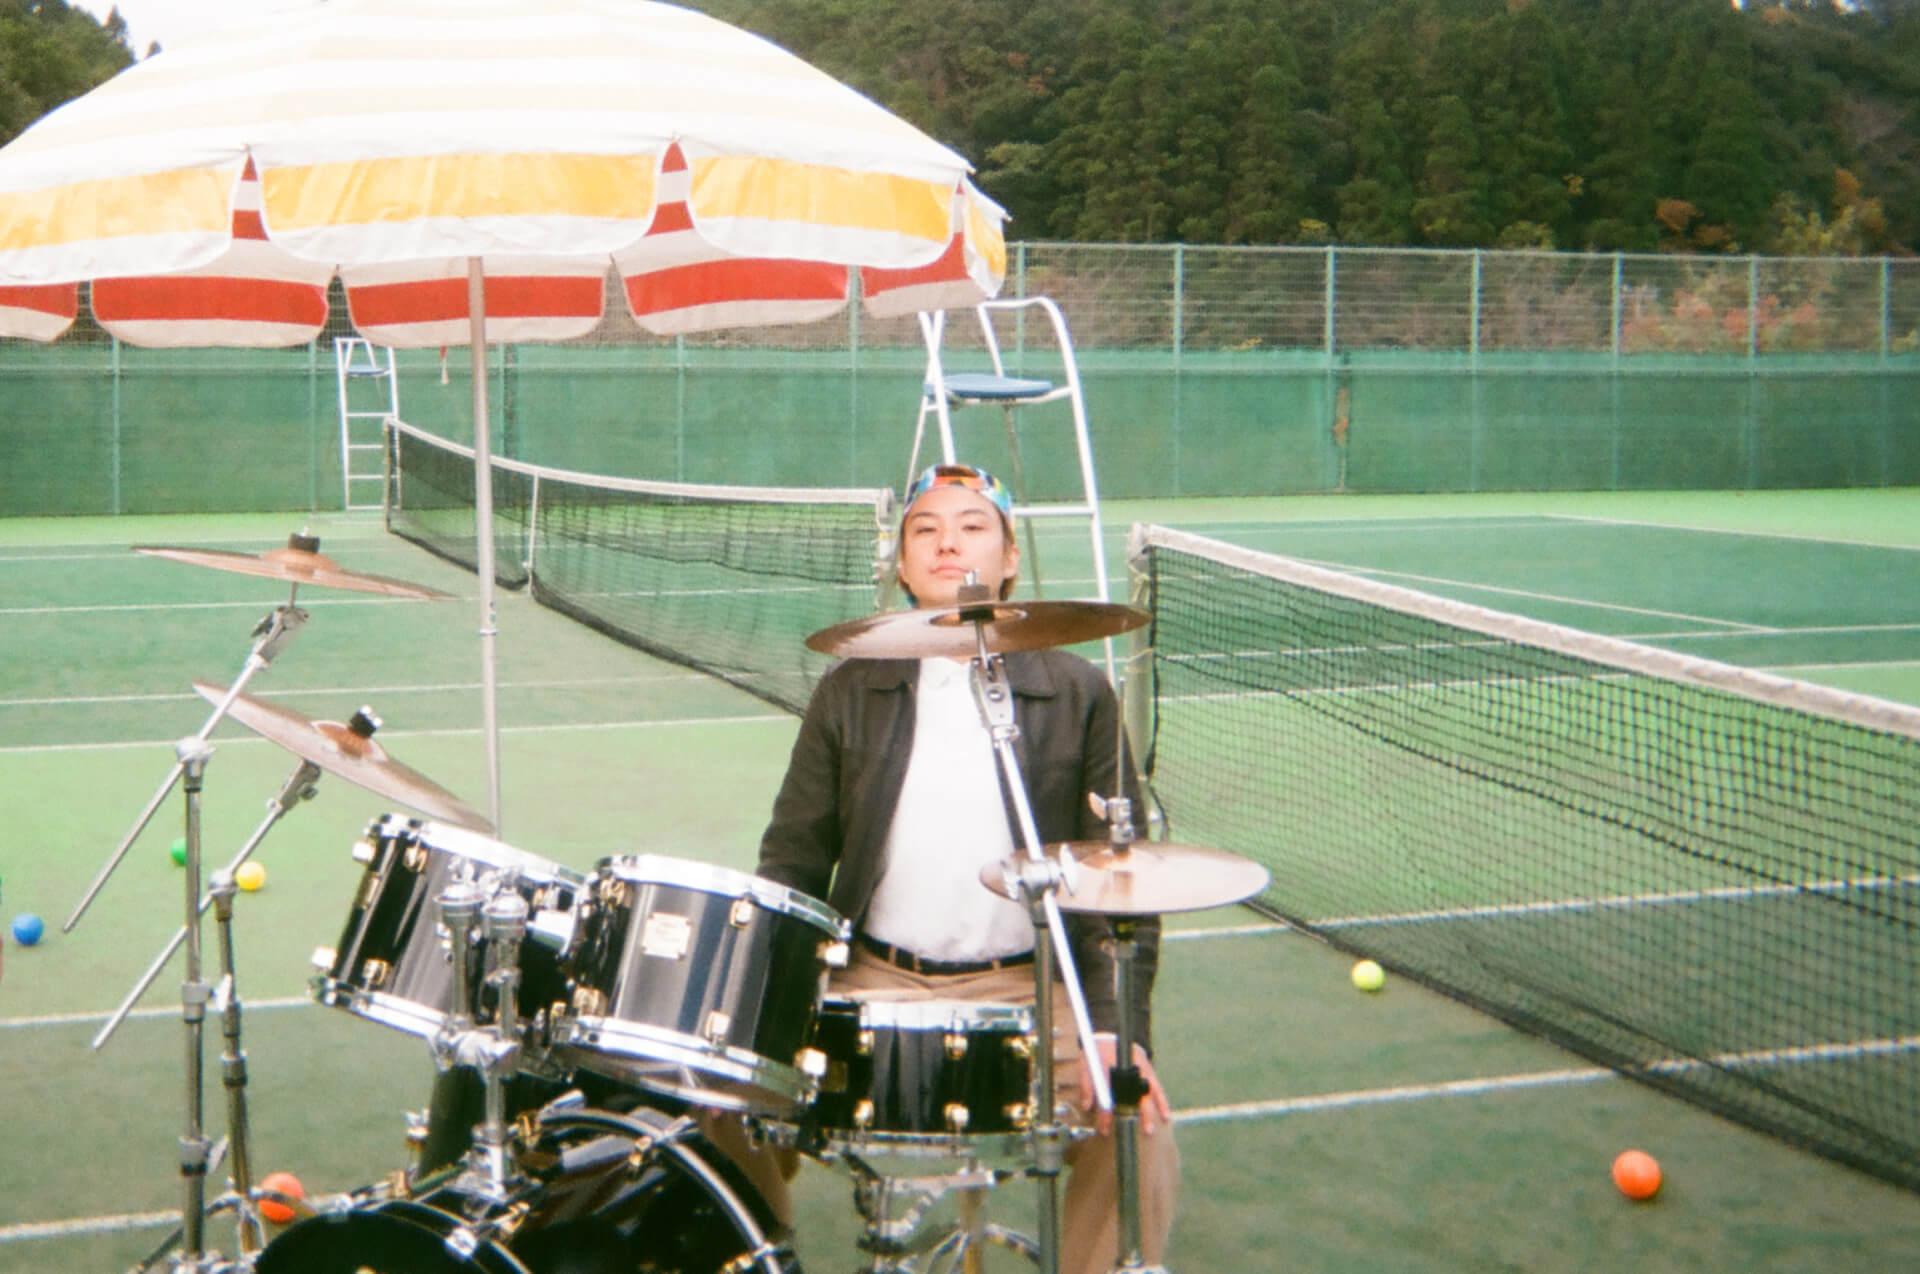 TENDOUJIのBuddy's Q 〜今さら聞けないあの質問〜|vol.2:ドラムの展望と昔の仕事 music210107_TENDOUJI-02